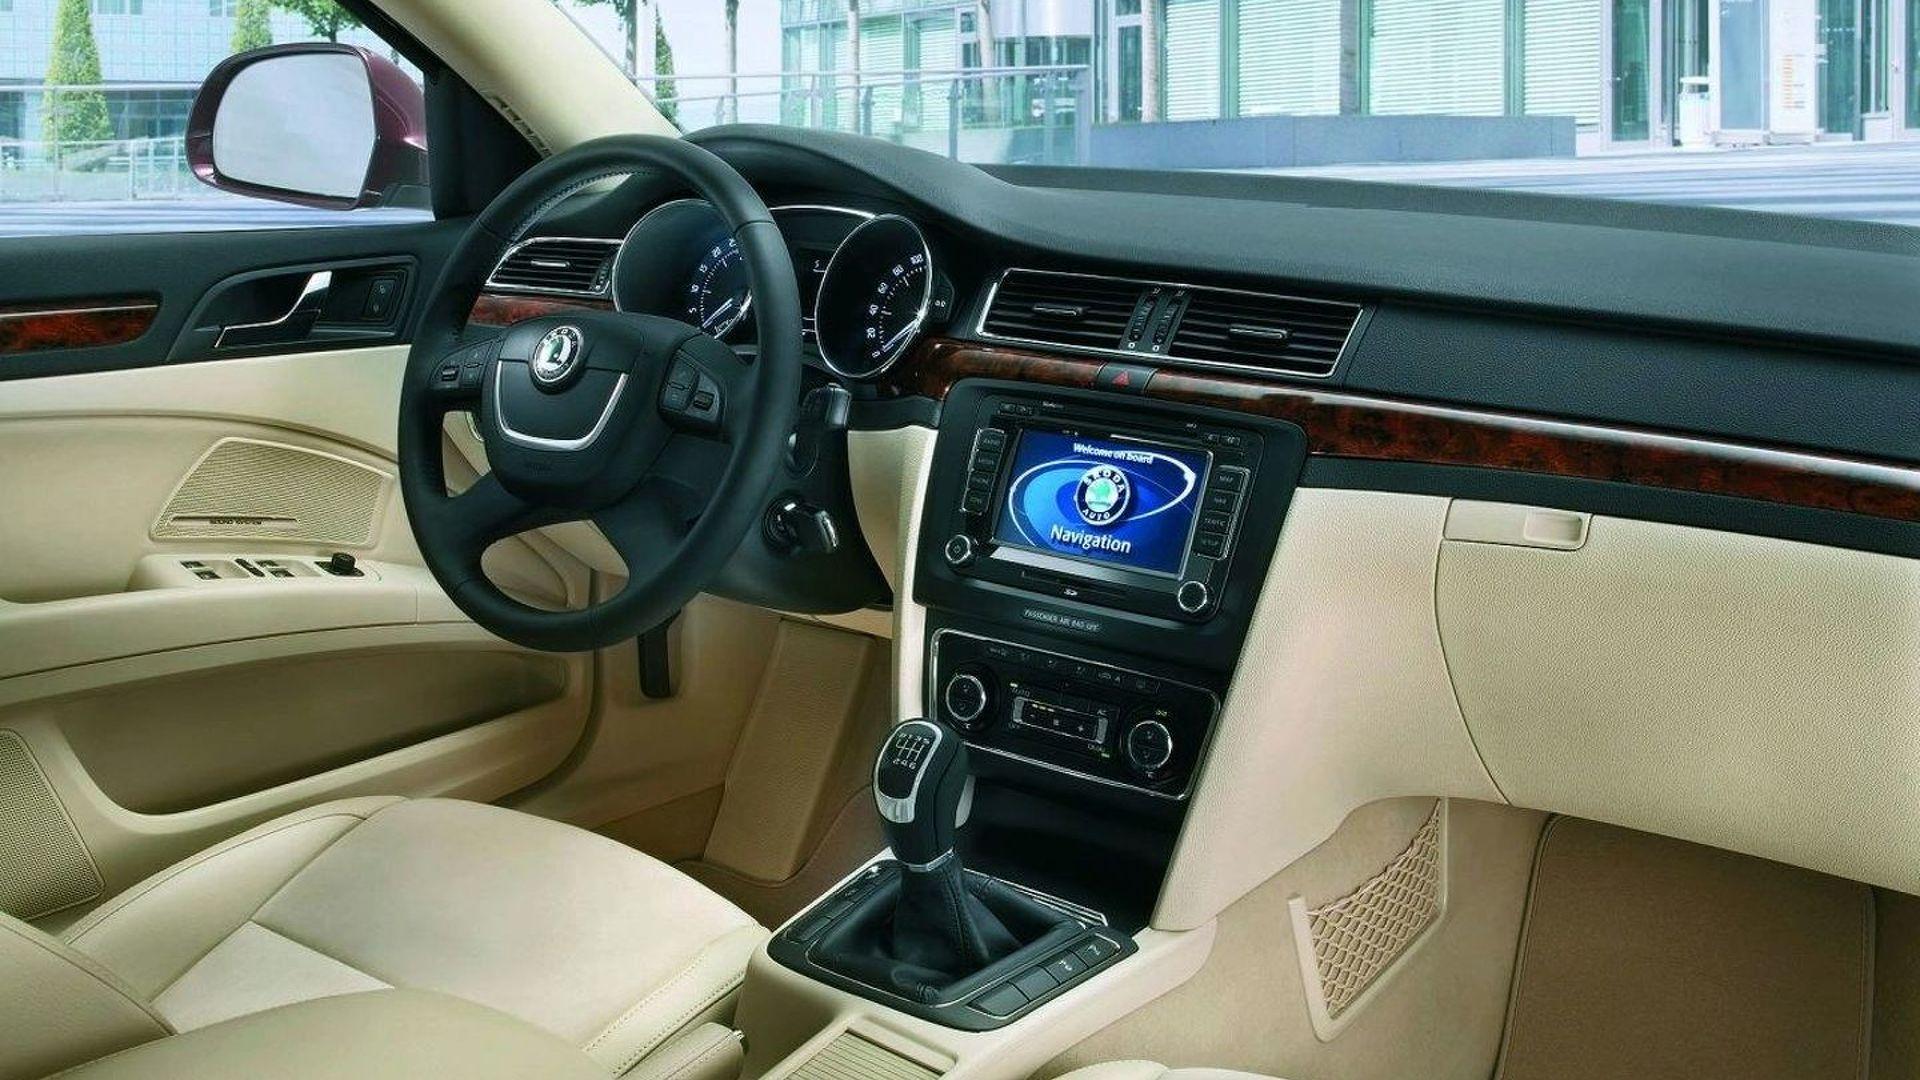 Skoda Superb Interior and Twindoor Revealed